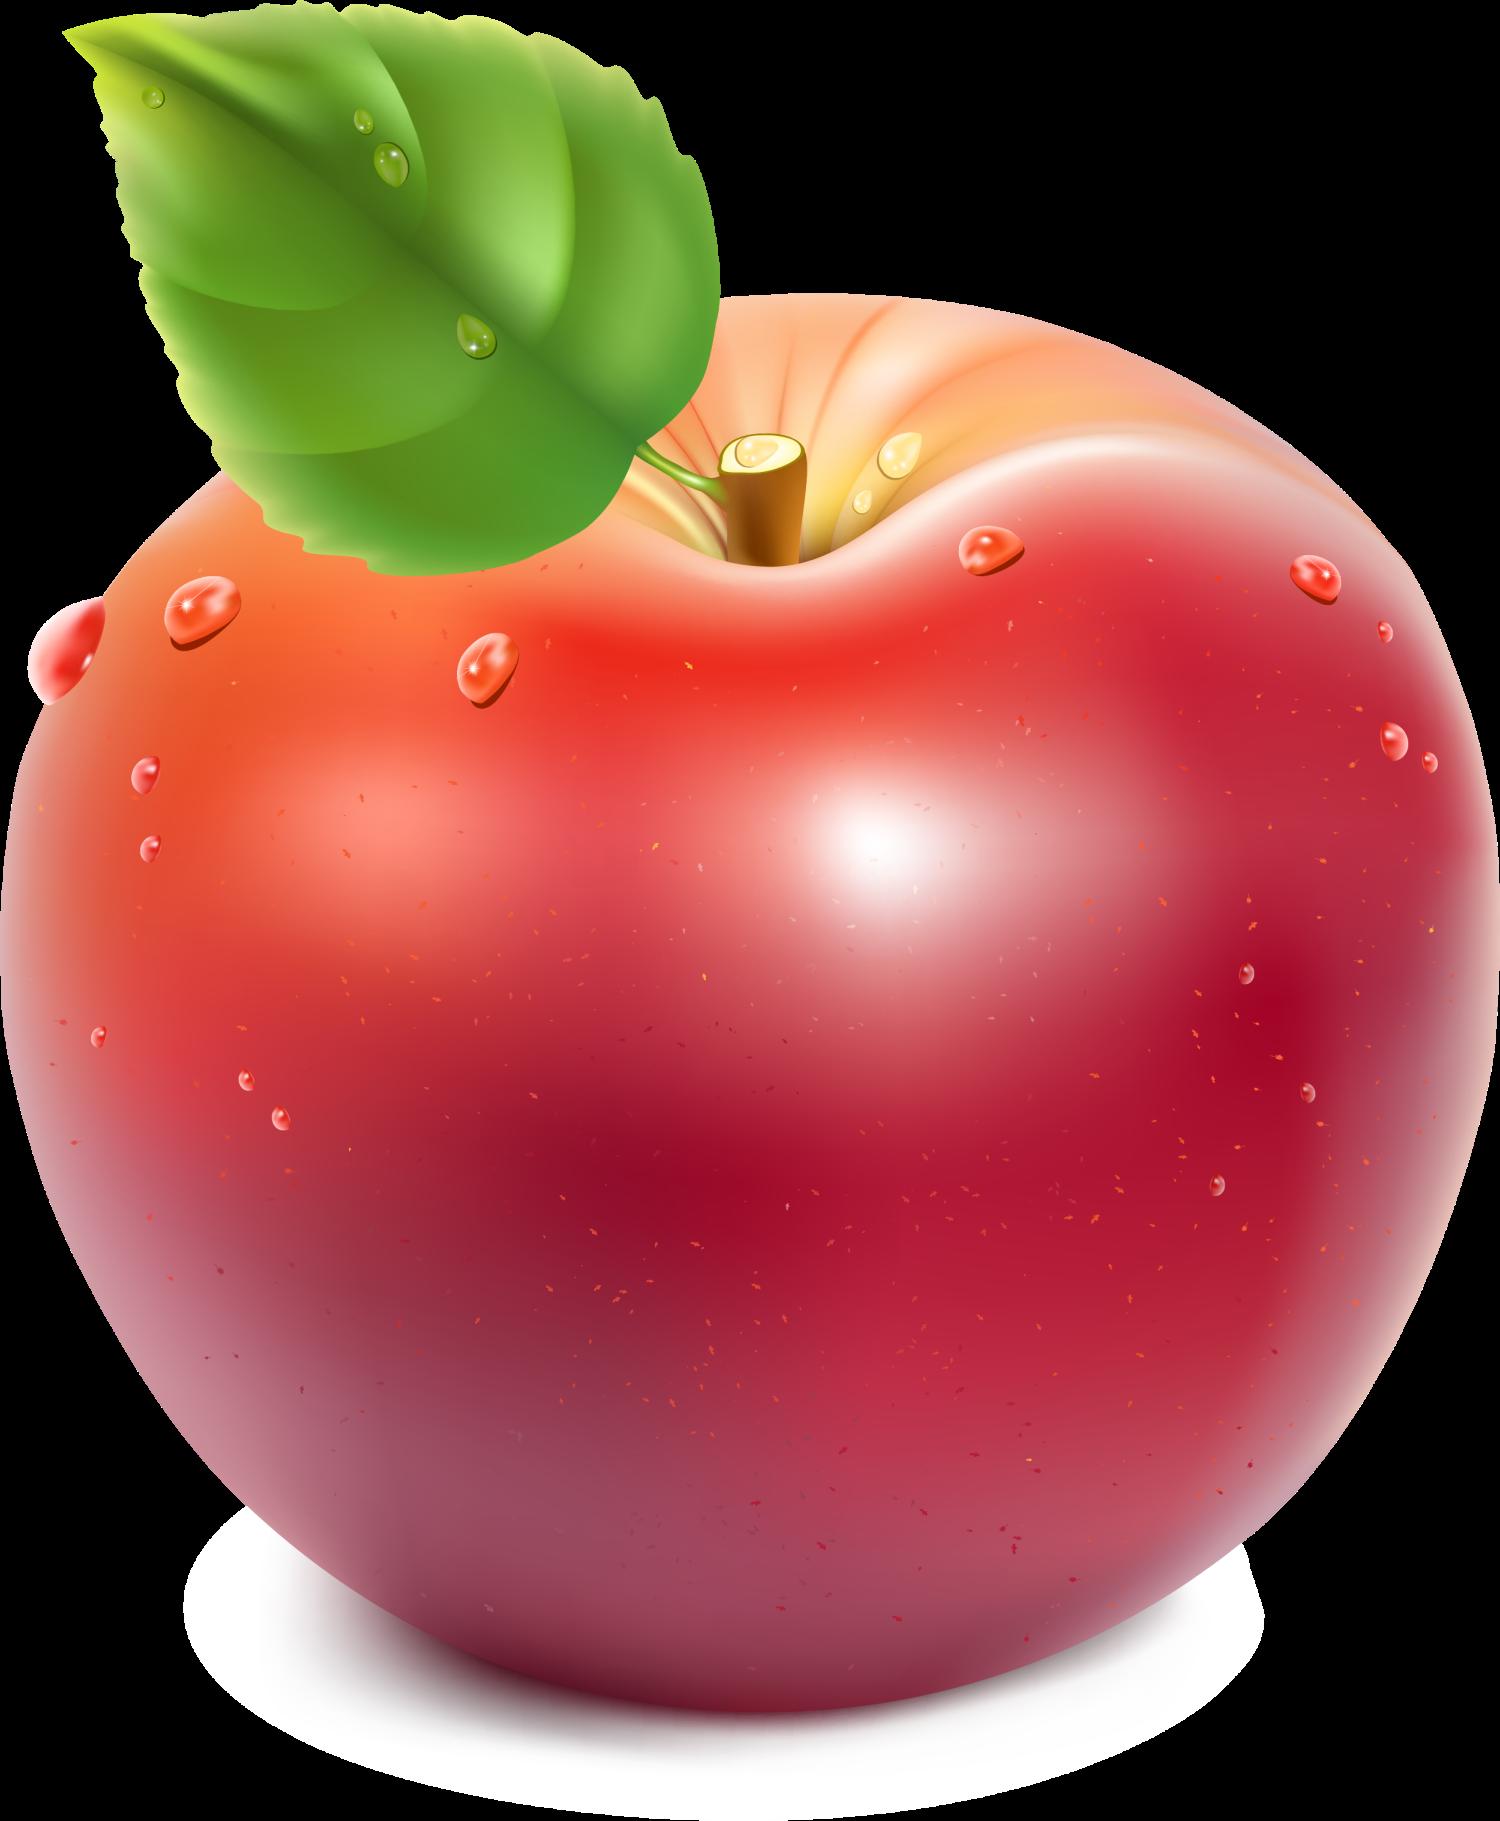 Cartoon apple free clipart banner freeuse download Apple Royalty-free Clip art - Red cartoon apple 1500*1821 transprent ... banner freeuse download